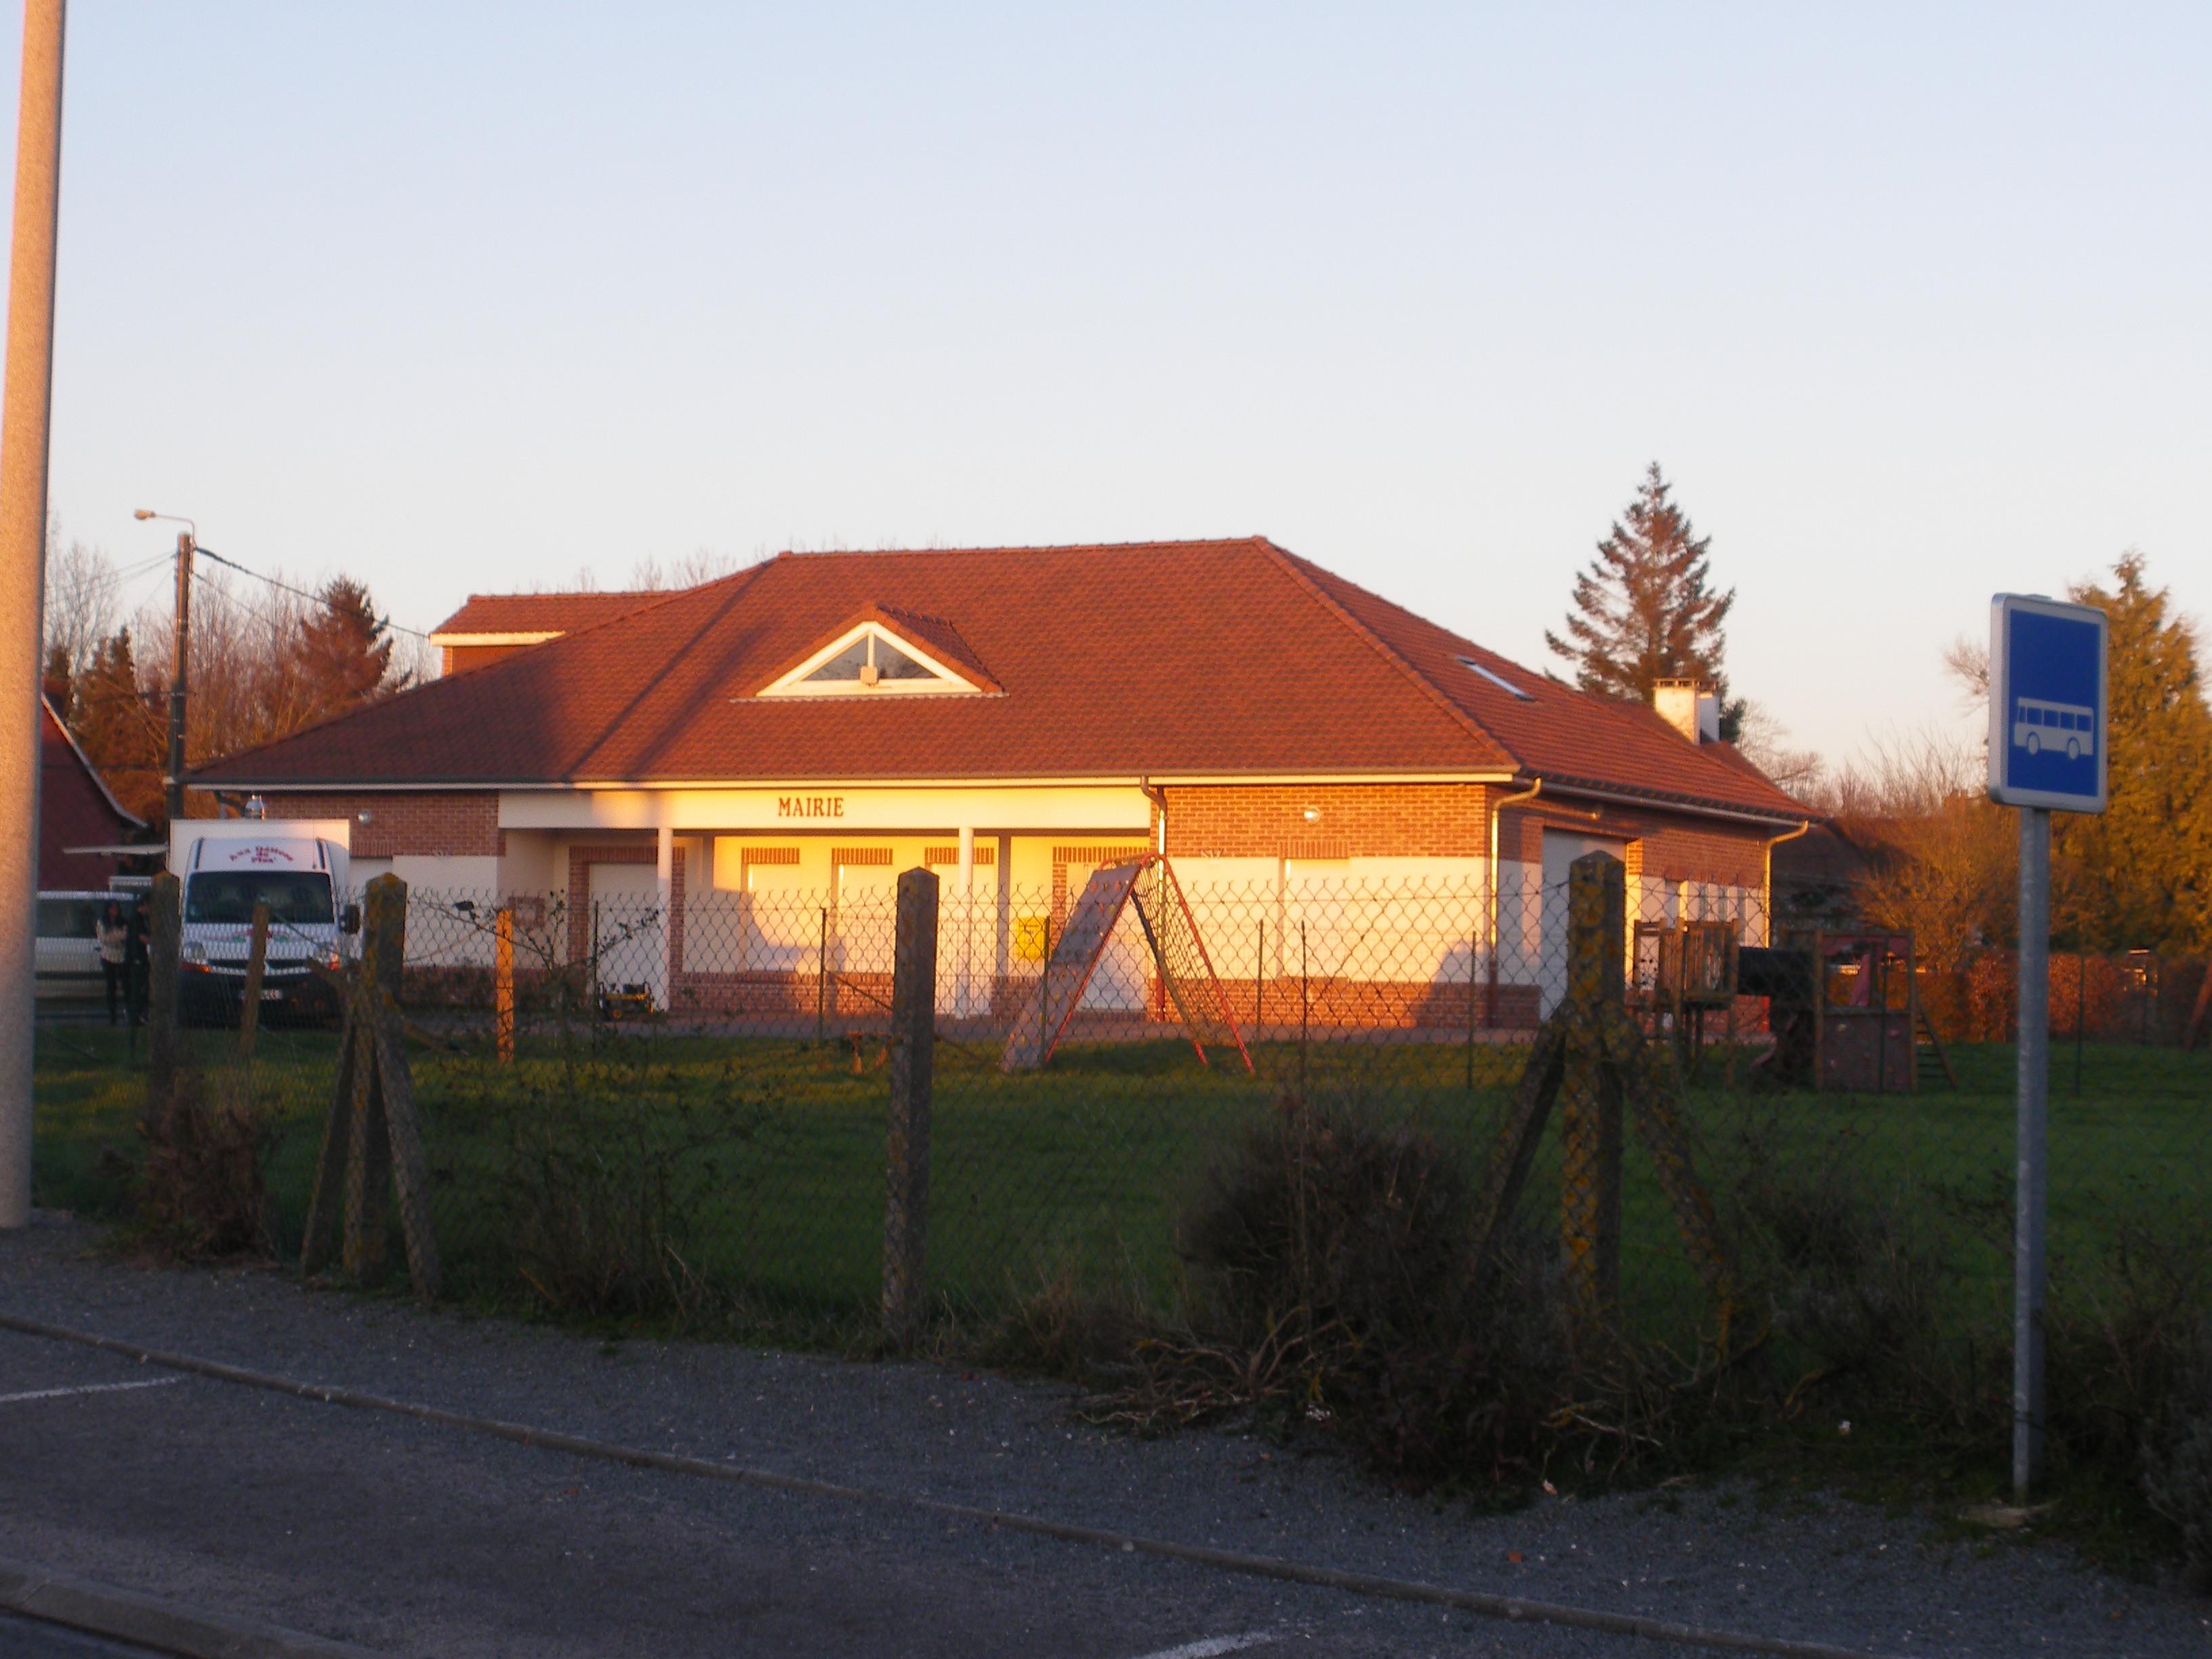 Capelle-lès-Hesdin